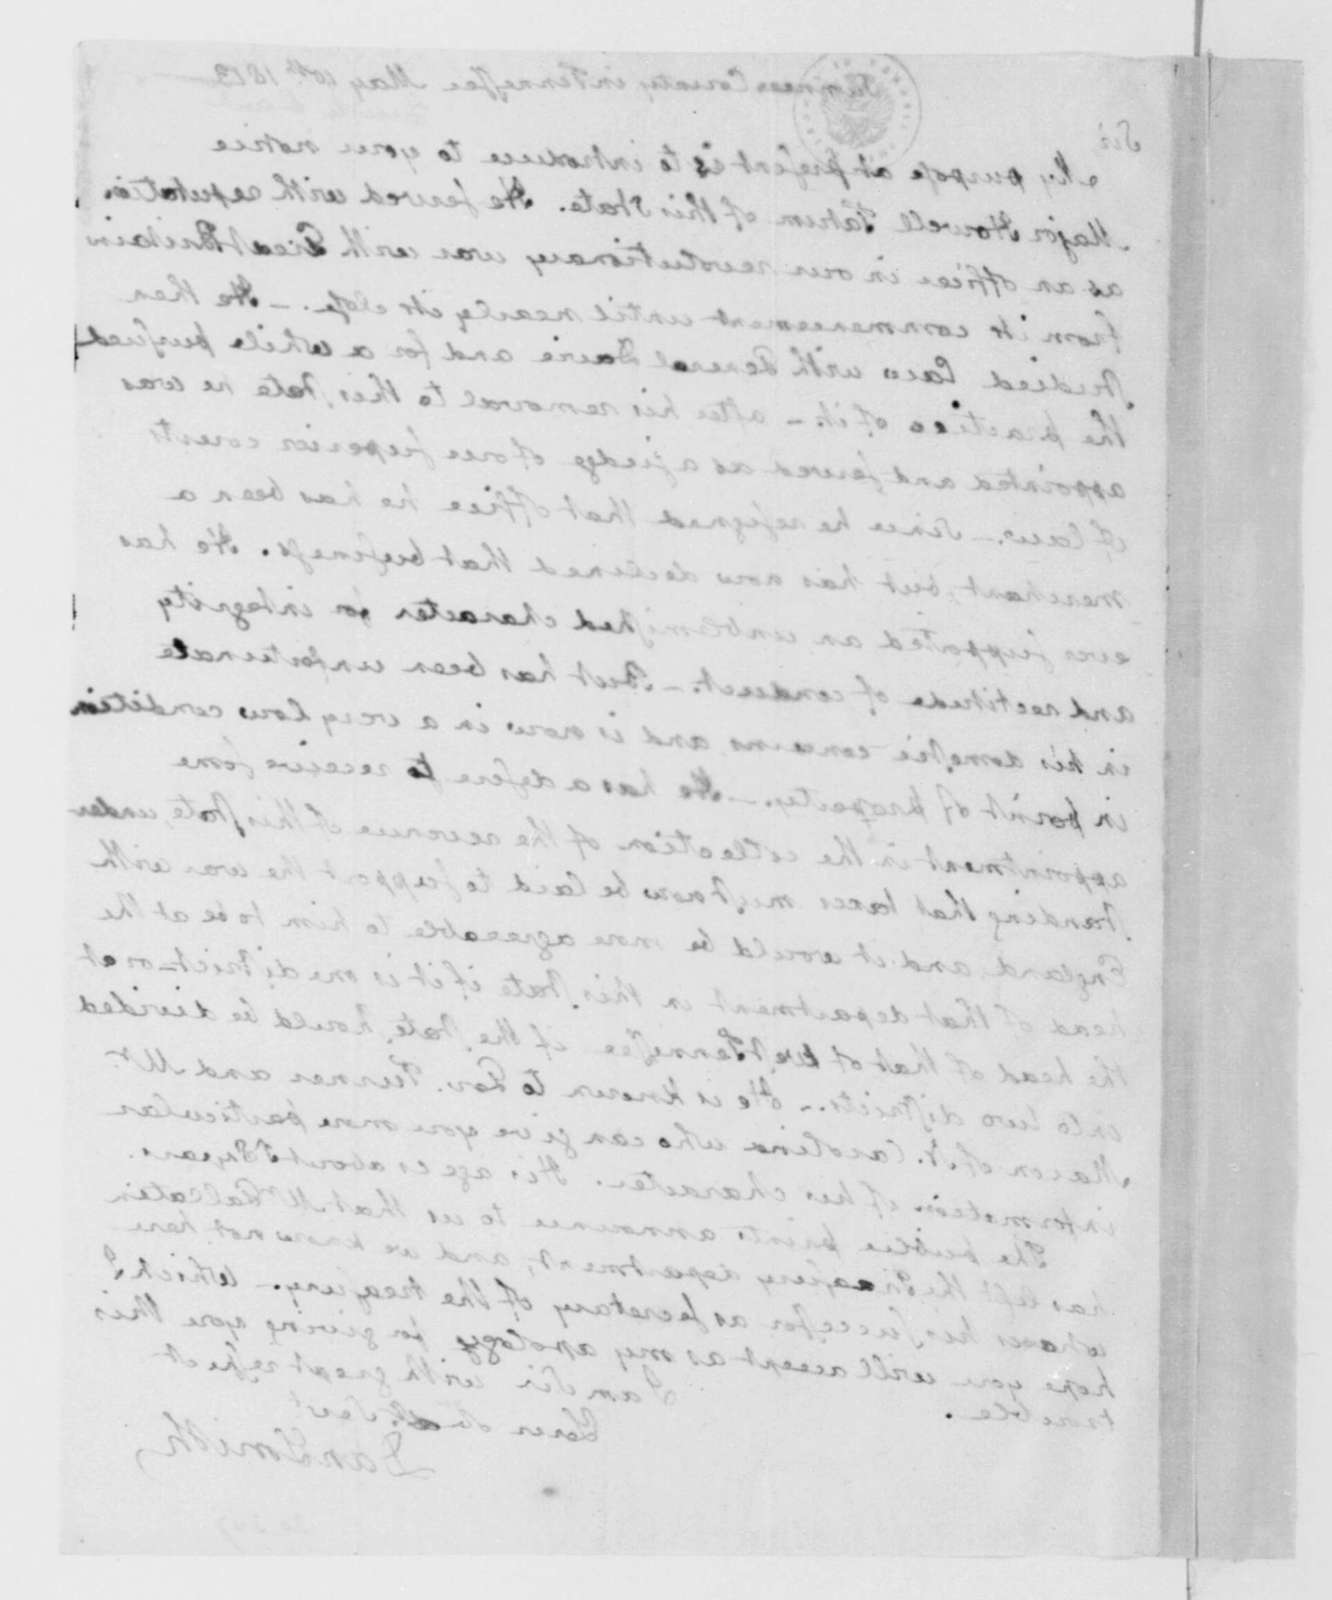 Dan Smith to James Madison, May 10, 1813.